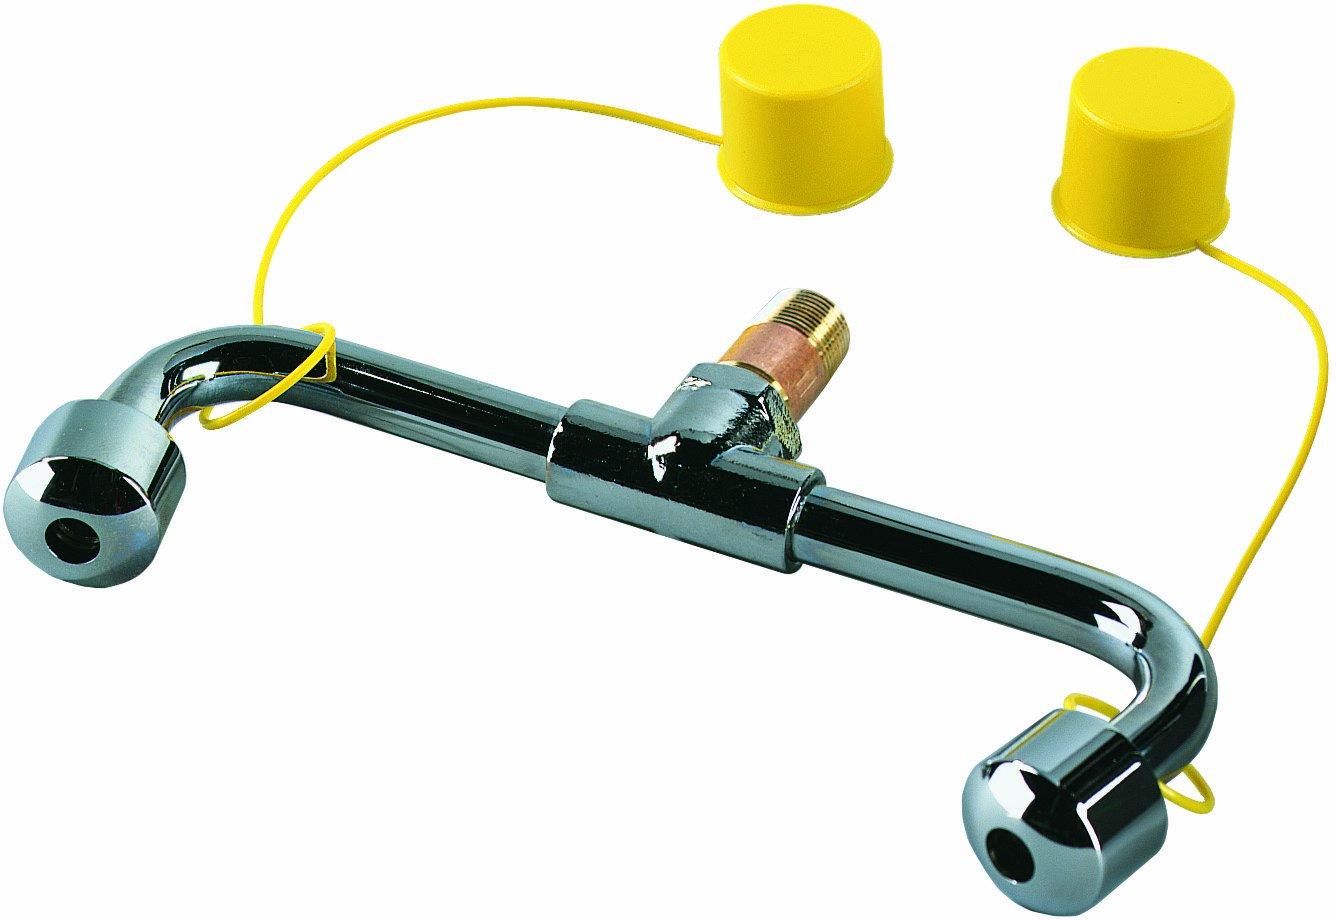 Bradley S39-394 Eyewash Spray Head Assembly with Supply Stem Bradley Fixtures Corporation